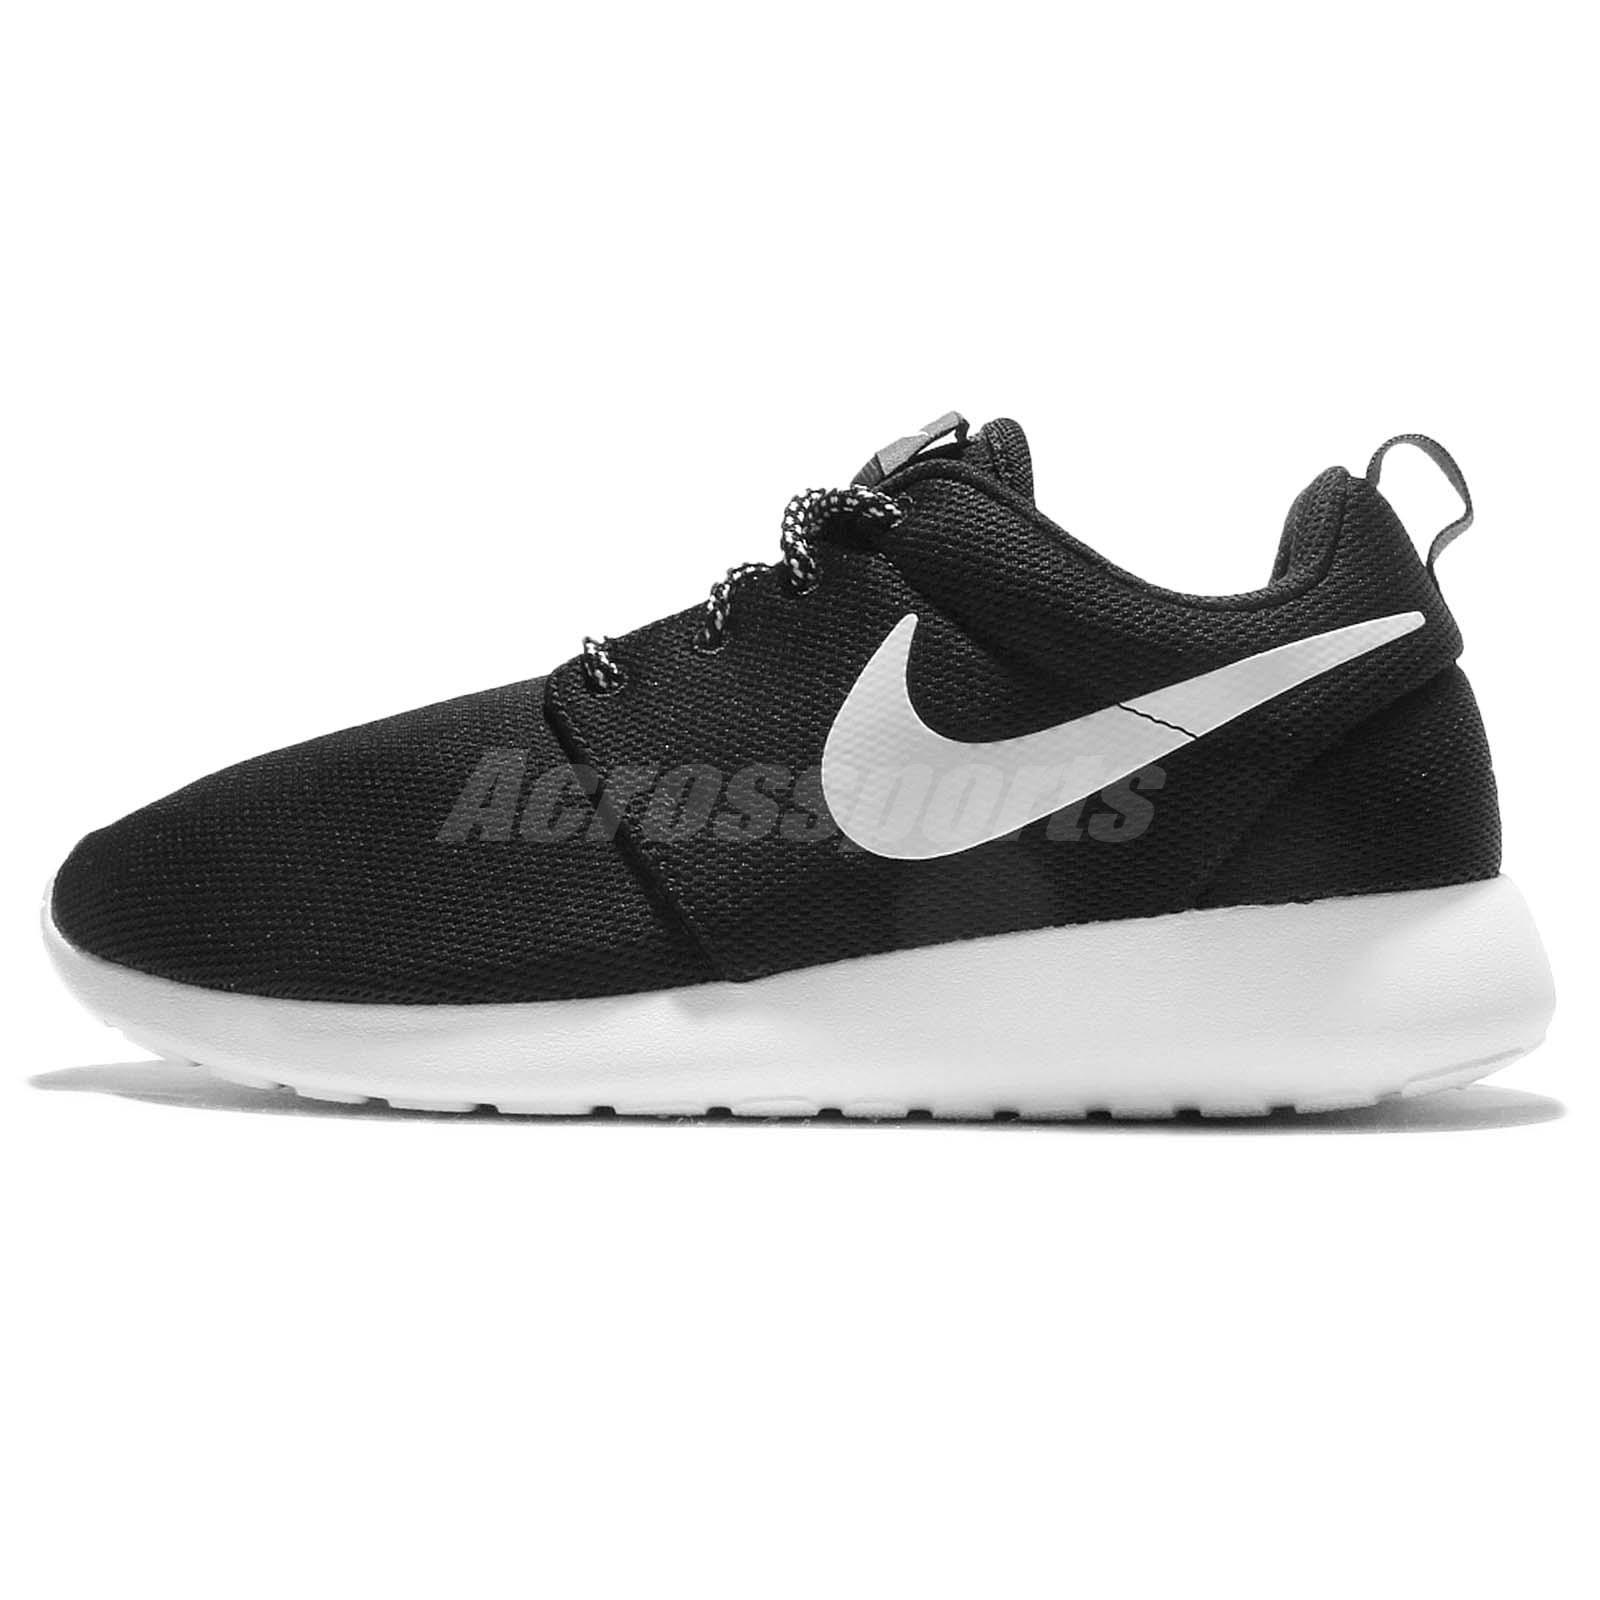 buy popular c0939 a30c6 Nike Wmns Roshe One Black White Rosherun Women Running Shoes Sneakers  844994-002